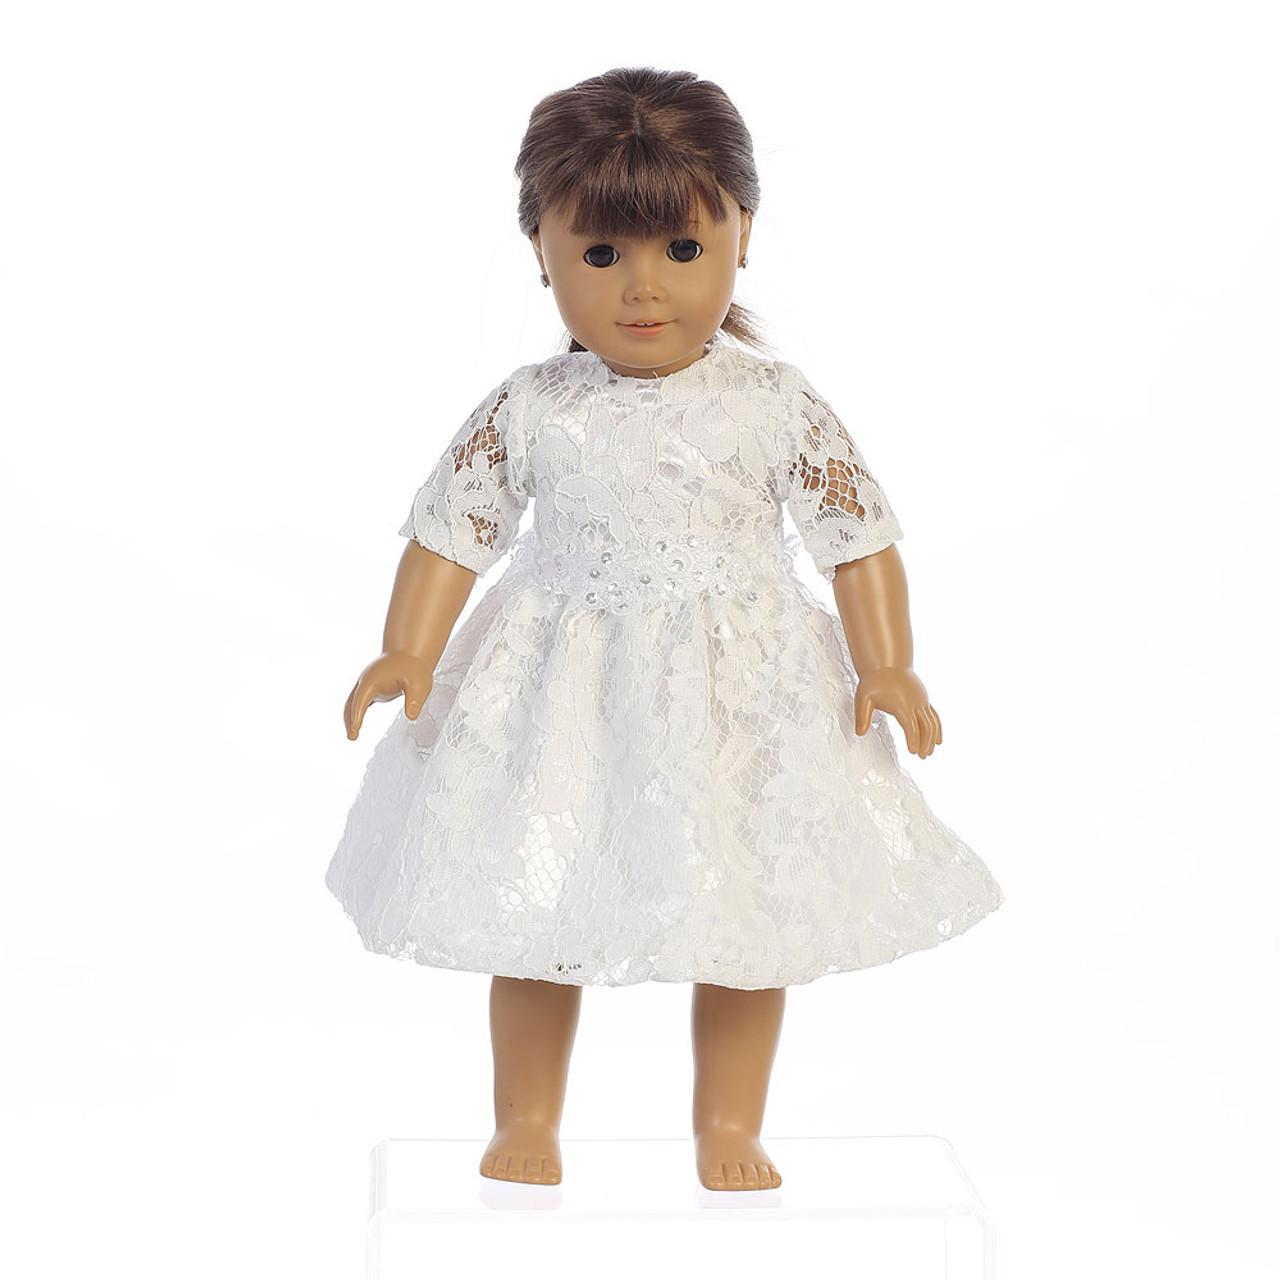 Giselle Doll Dress